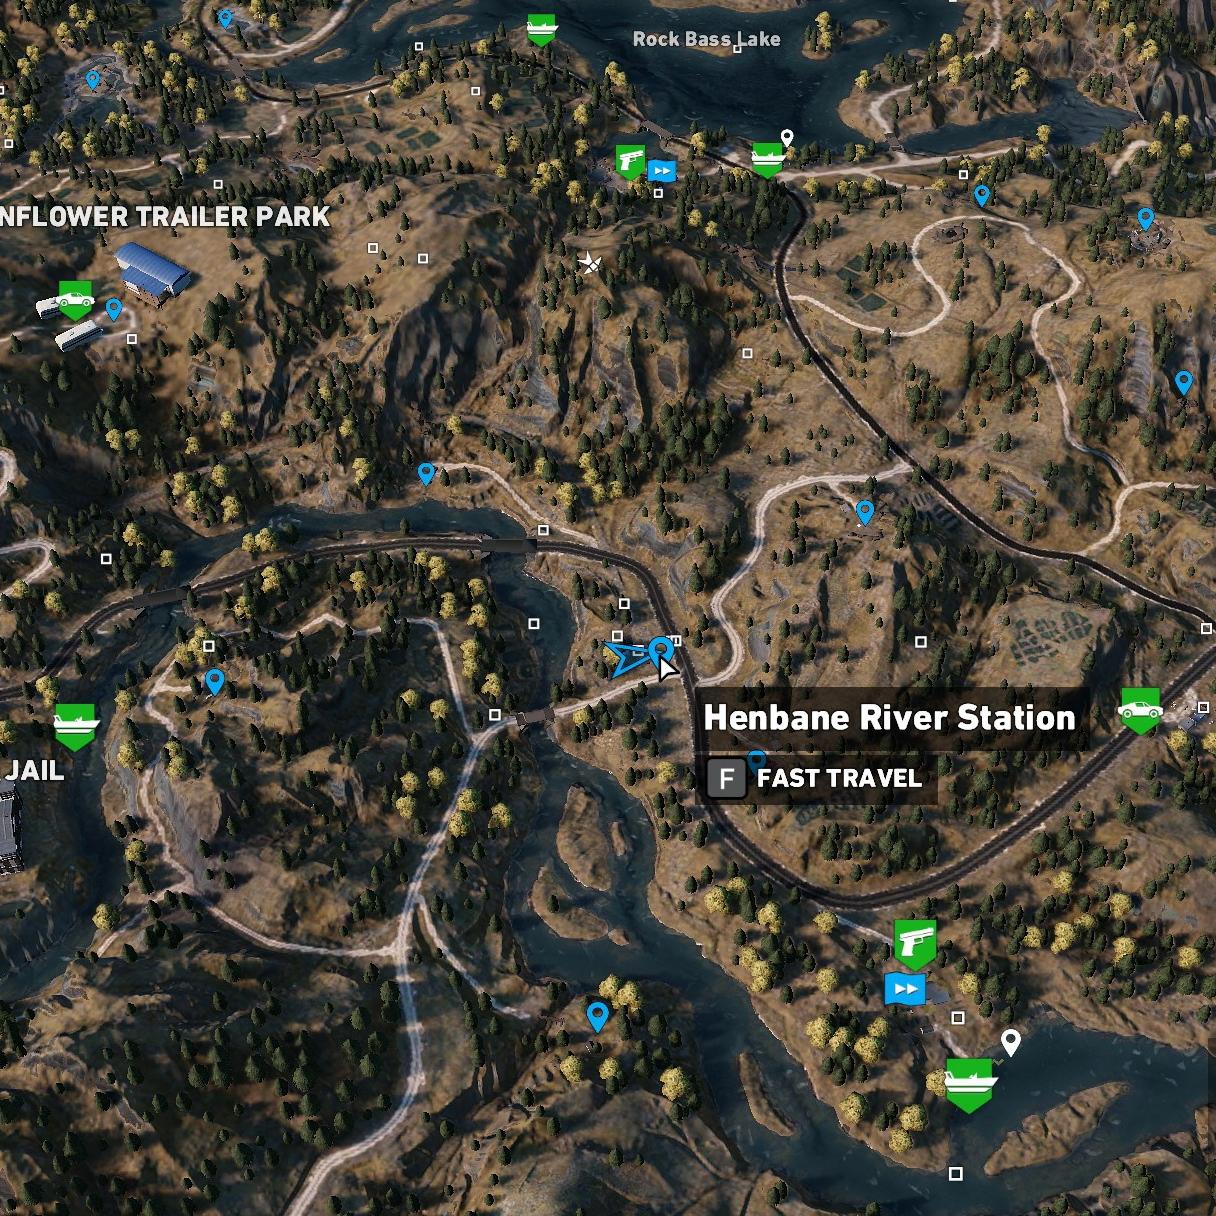 Henbane River Station Far Cry Wiki Fandom